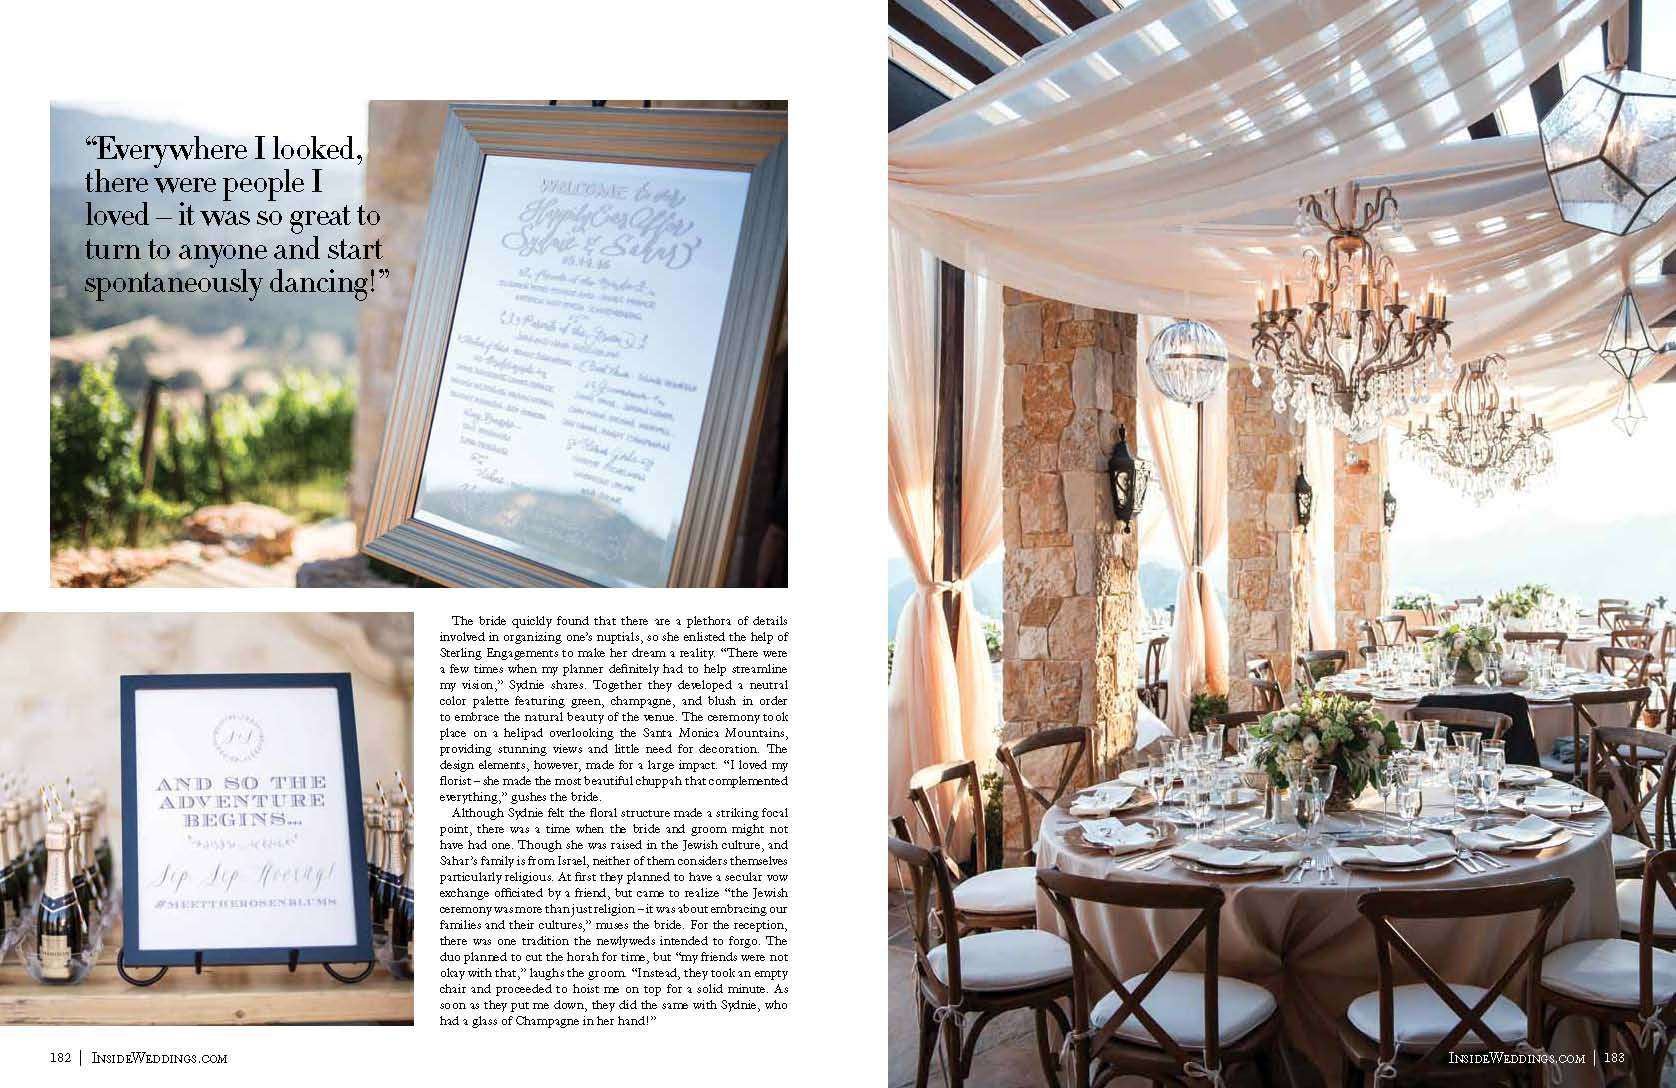 Malibu Rocky Oaks Wedding in Inside Weddings Magazine! | Lilla Bello